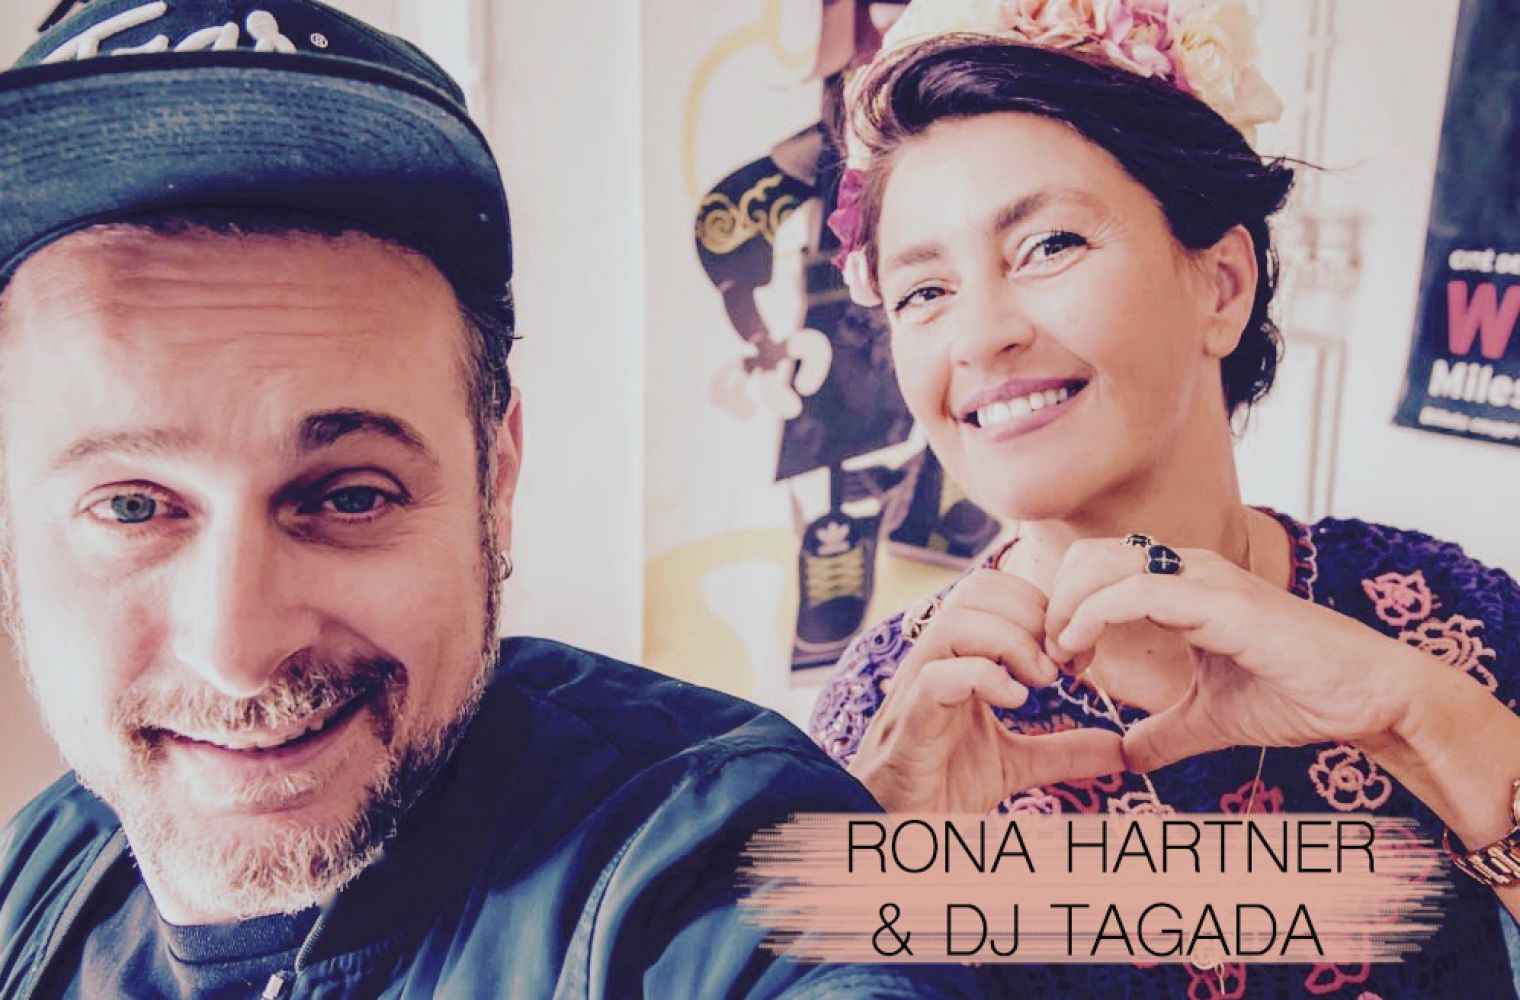 RONA HARTNER & DJ TAGADA (France/ Roumanie)